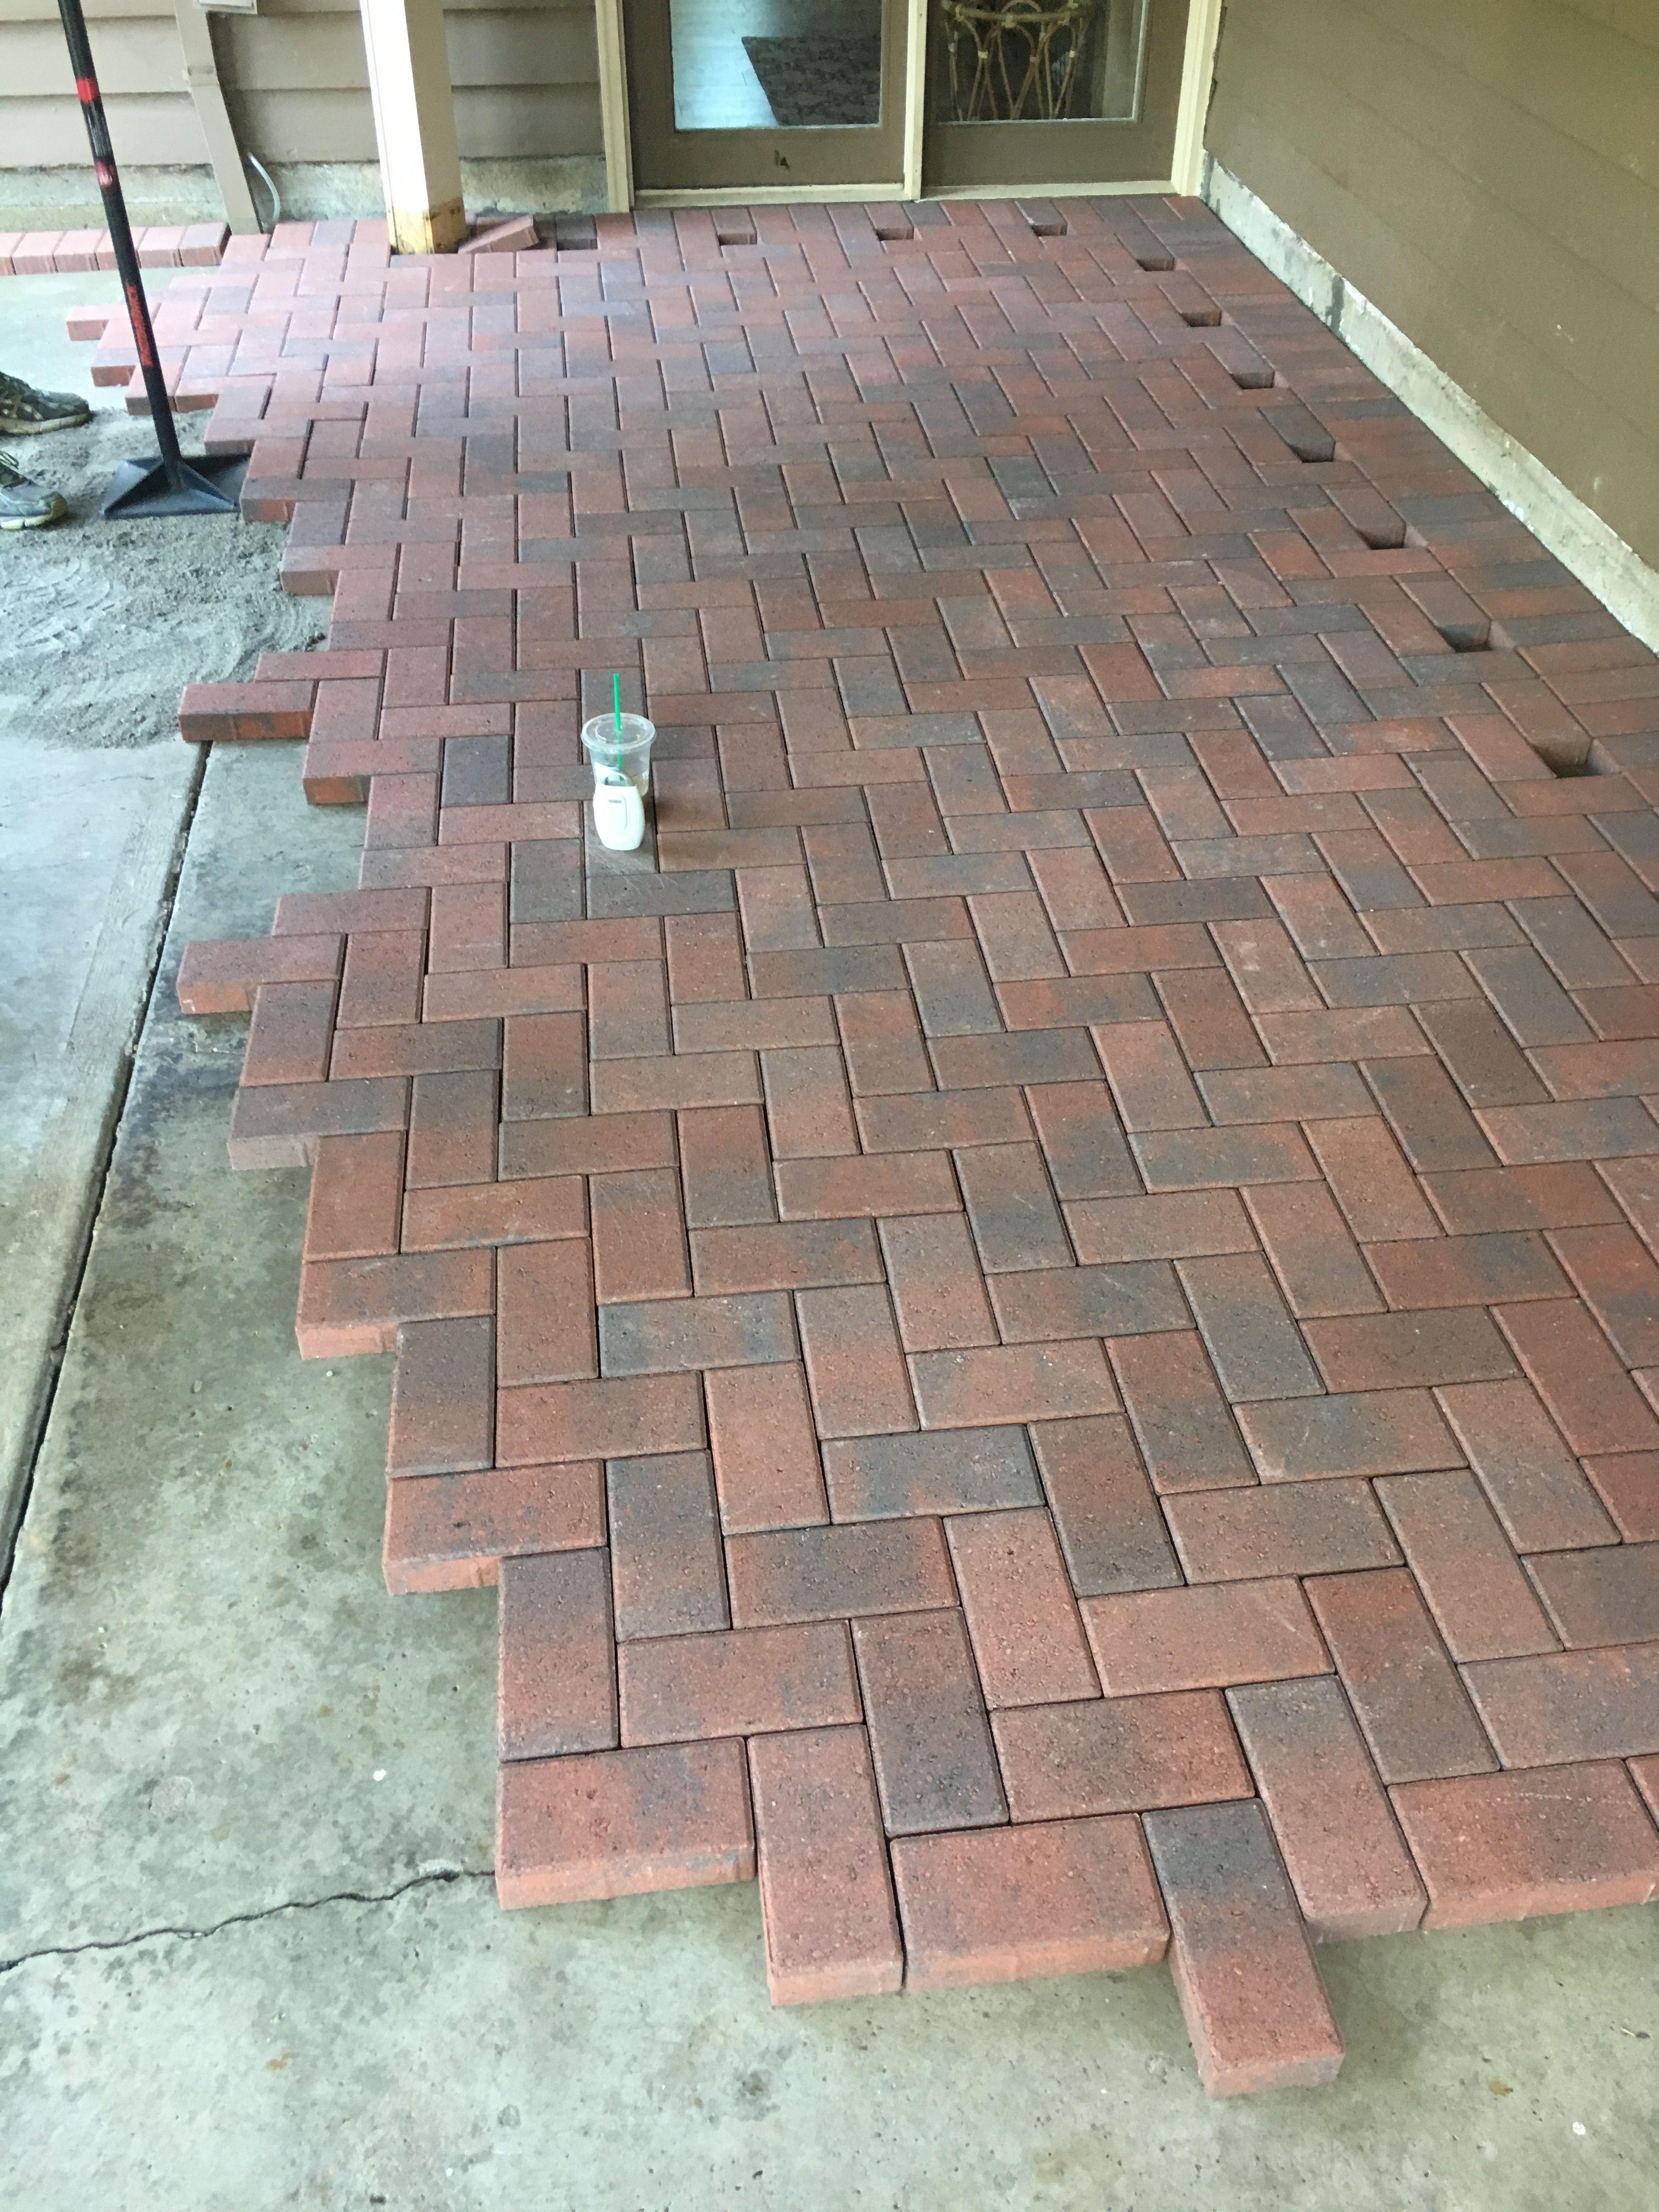 DIY Herringbone Red Brick Pavers | Piso de ladrillo, Piso ... on Red Paver Patio Ideas id=44259